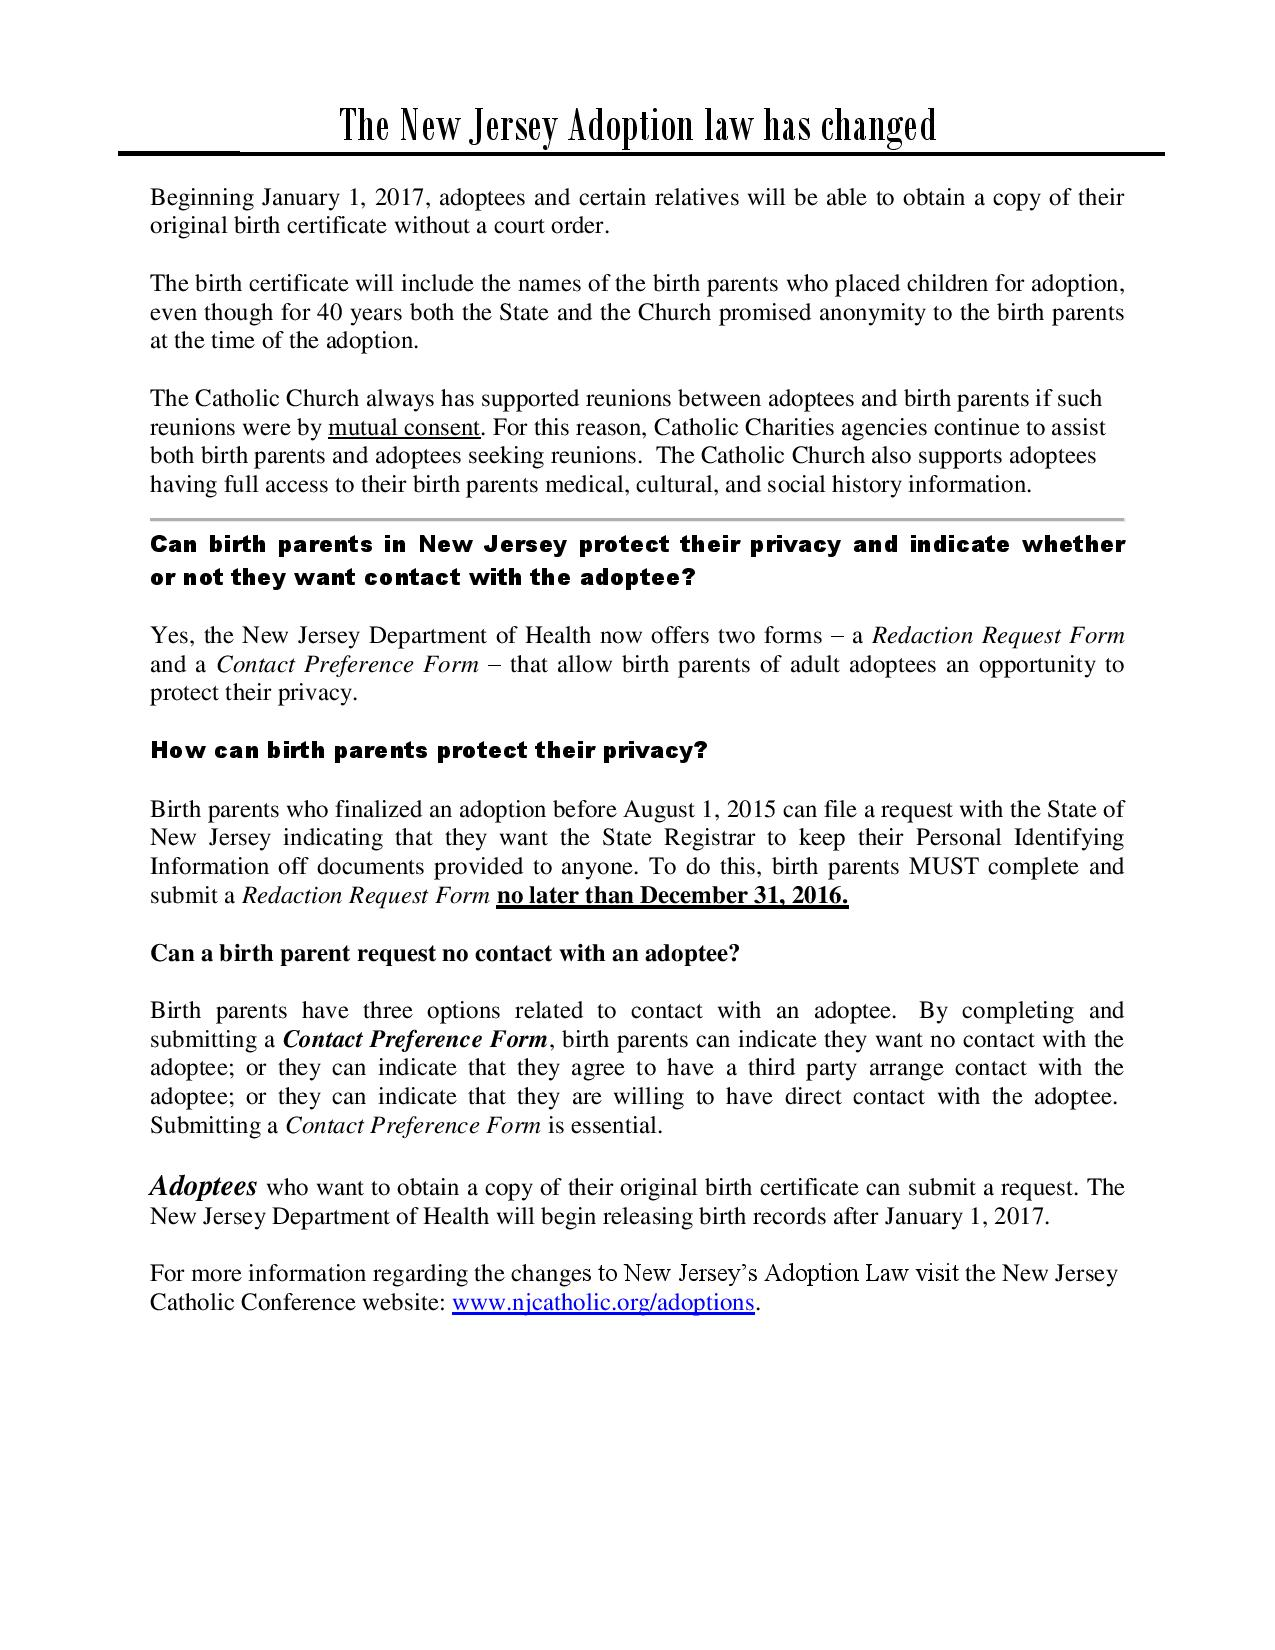 The Nj Adoption Law Has Changed Page 001 Catholic Charities